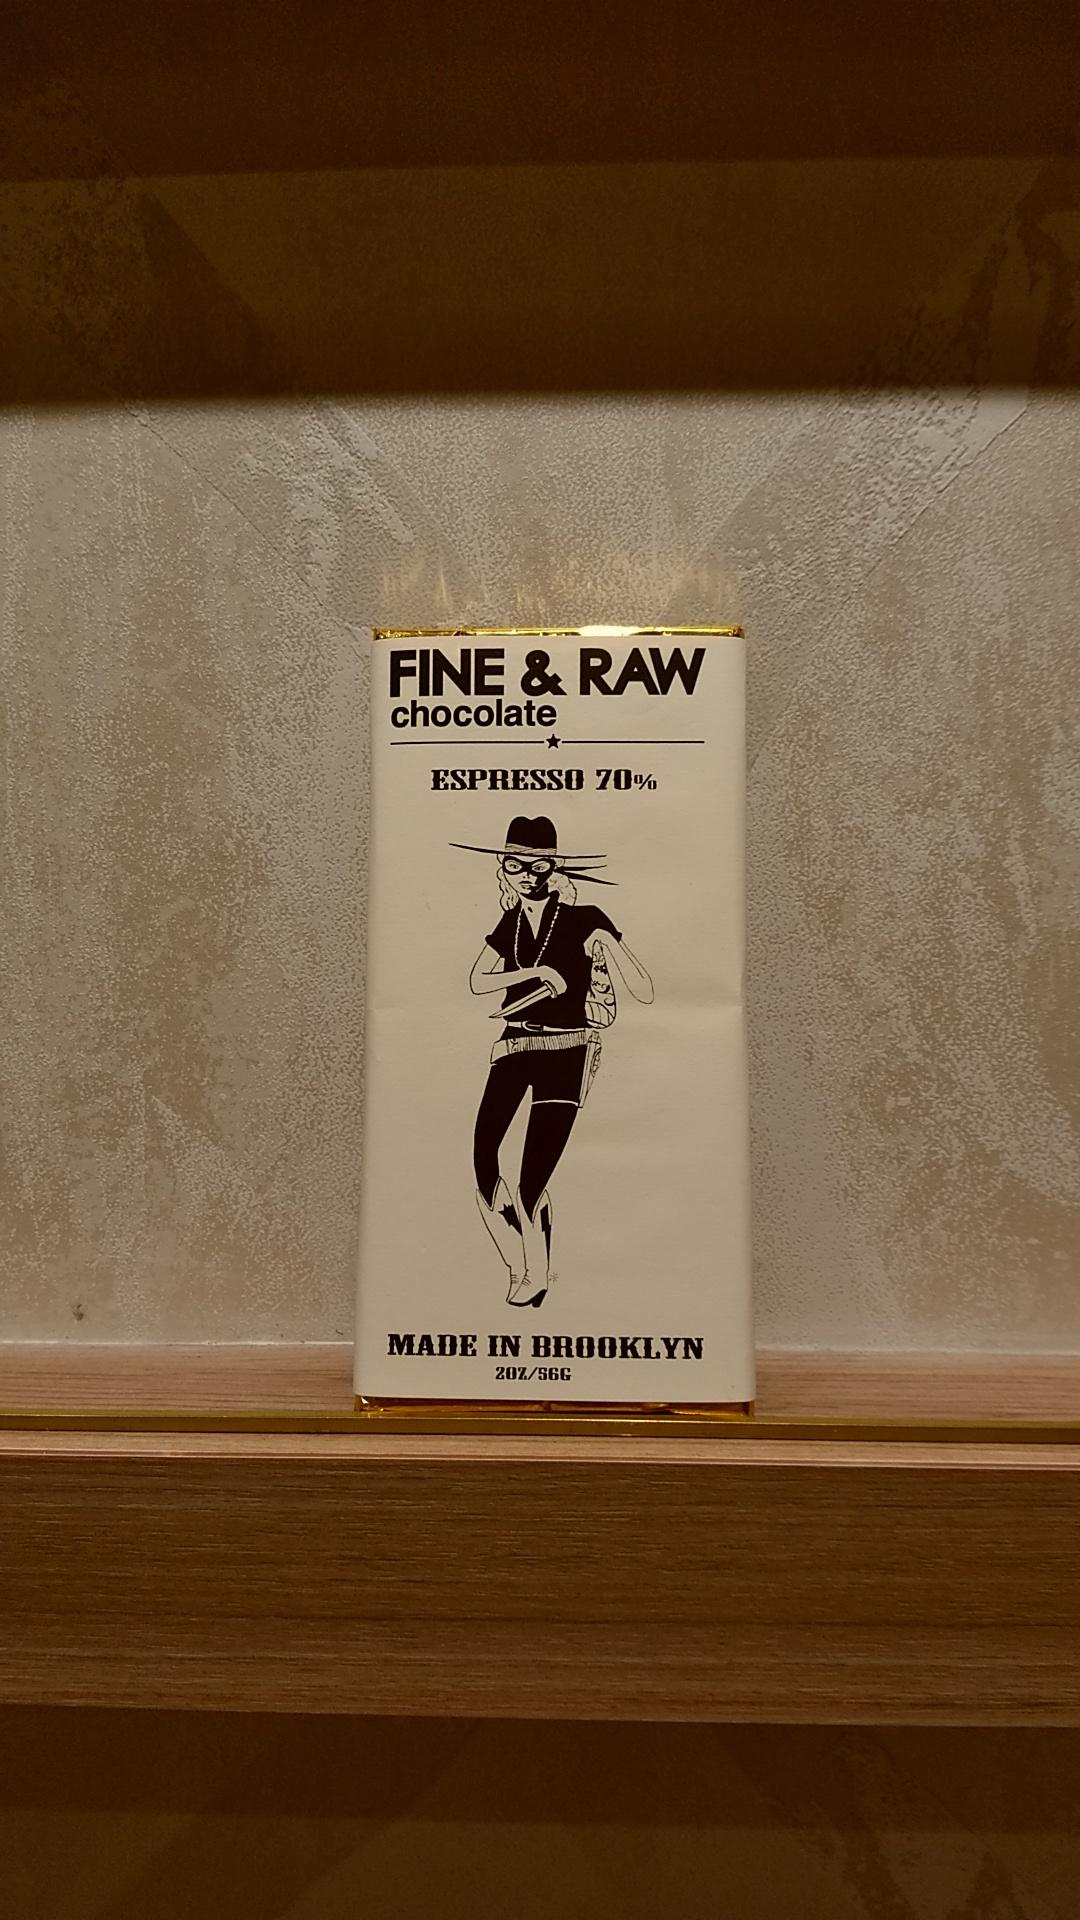 【FINE&RAW/ファインアンドロー】70%エスプレッソ(大サイズ)